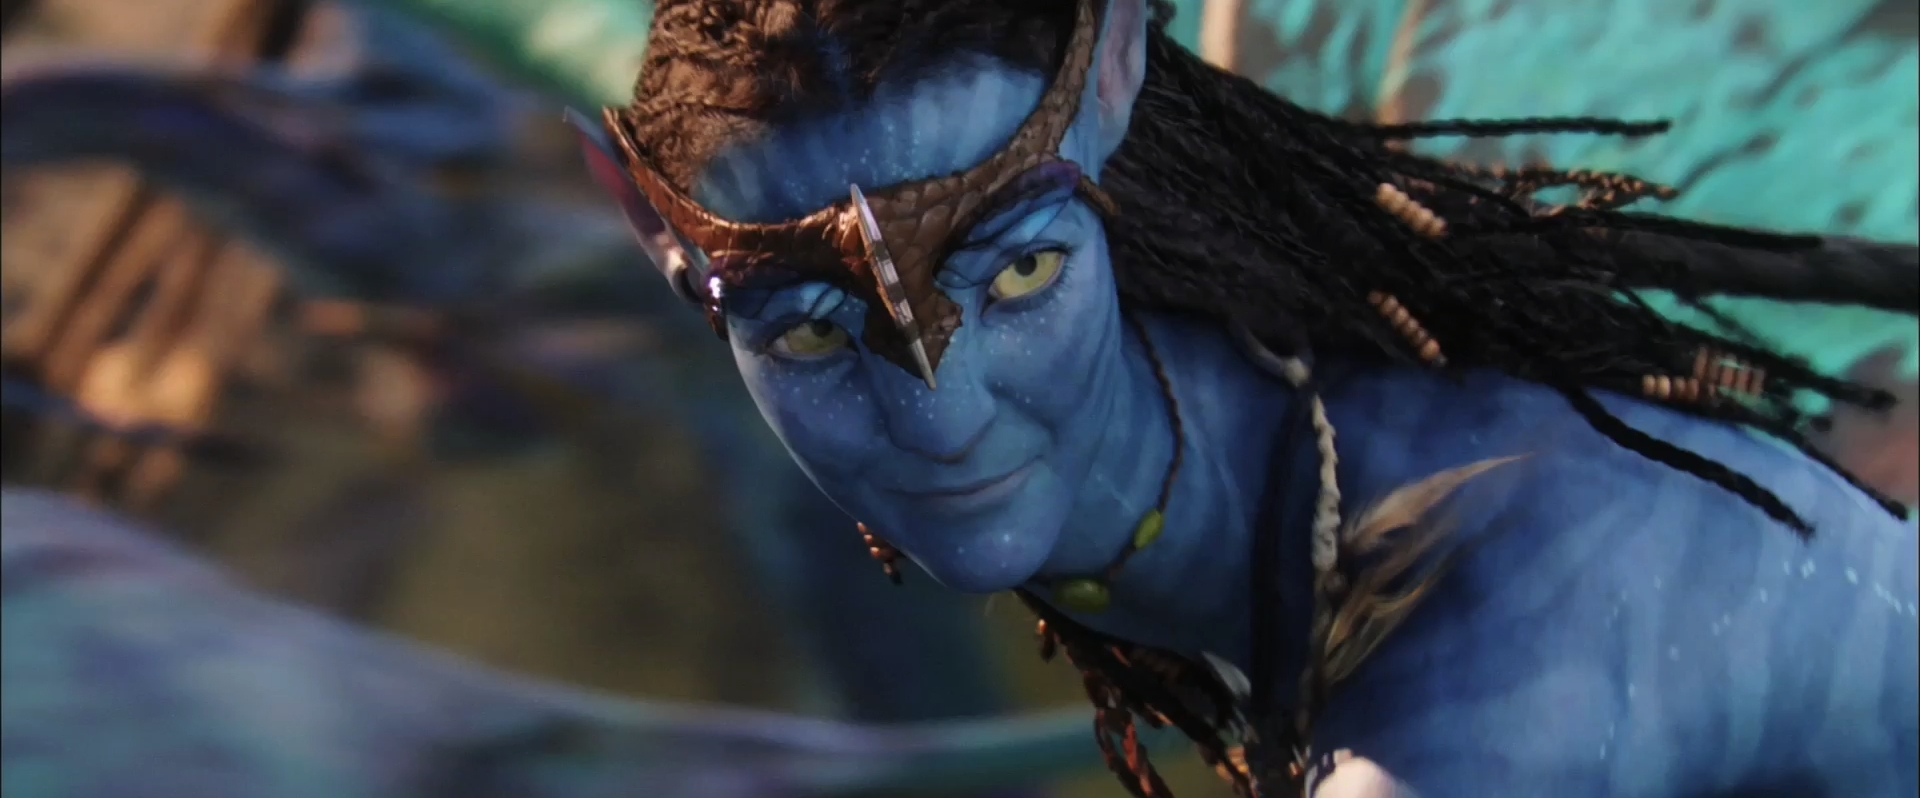 Avatar Trailer #2 HD Screencaps